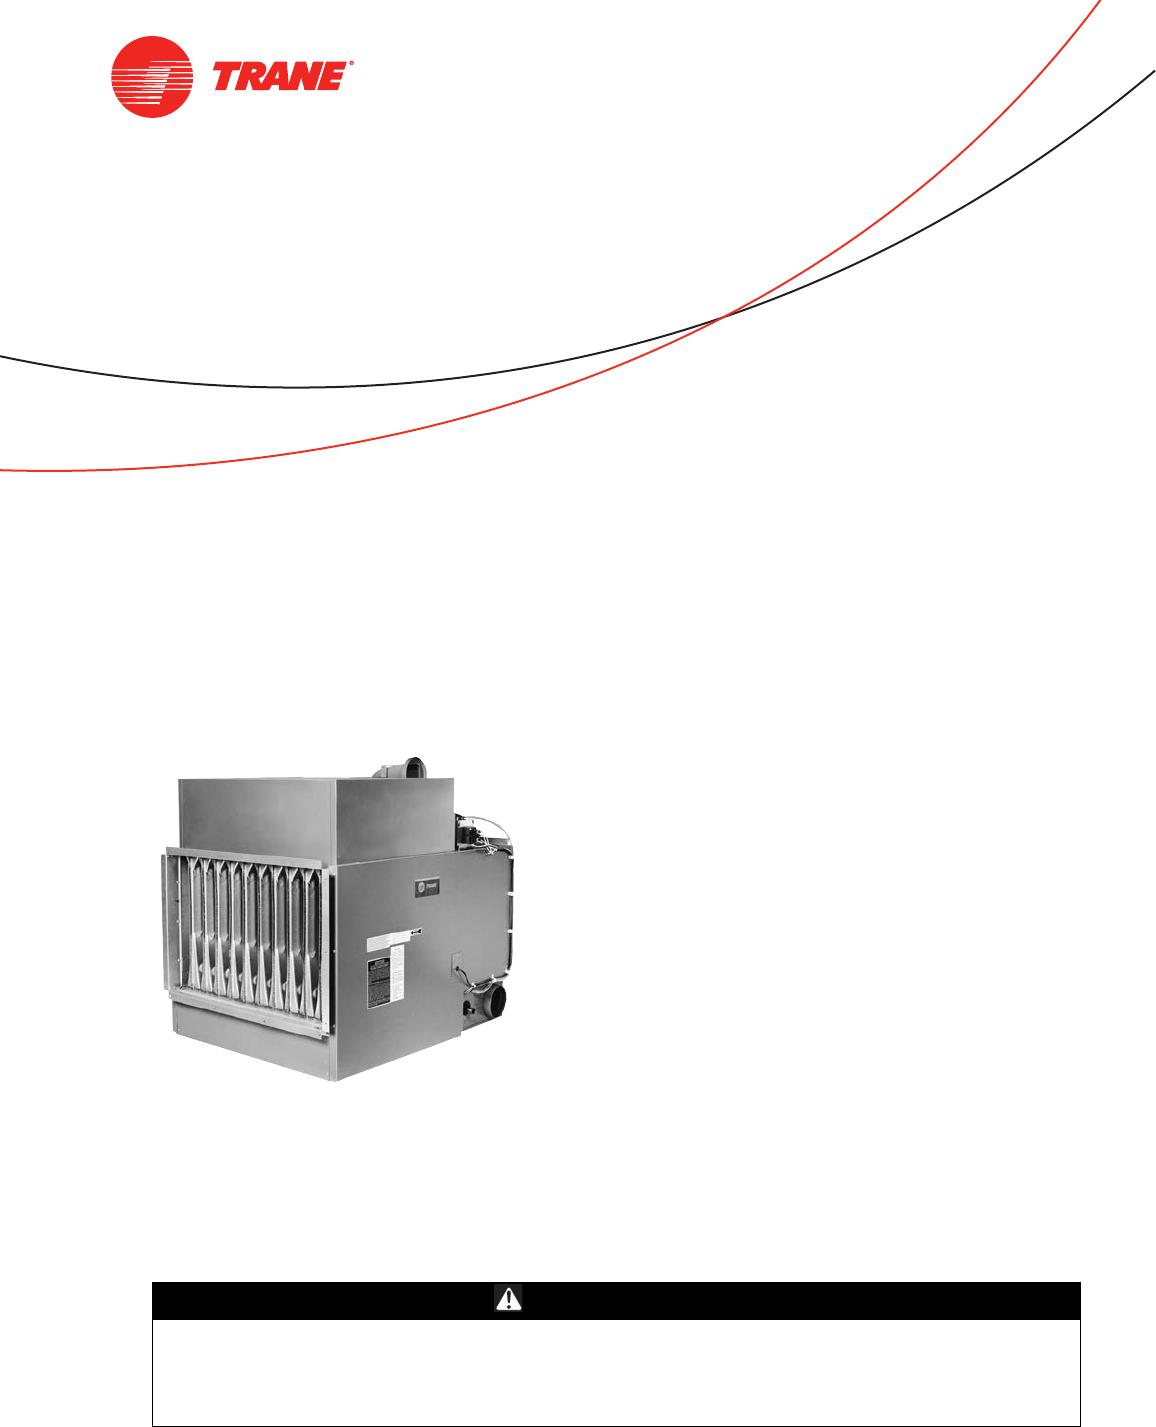 trane condensing unit wiring schematic trane gas fired unit heaters wiring diagram wiring diagram  trane gas fired unit heaters wiring